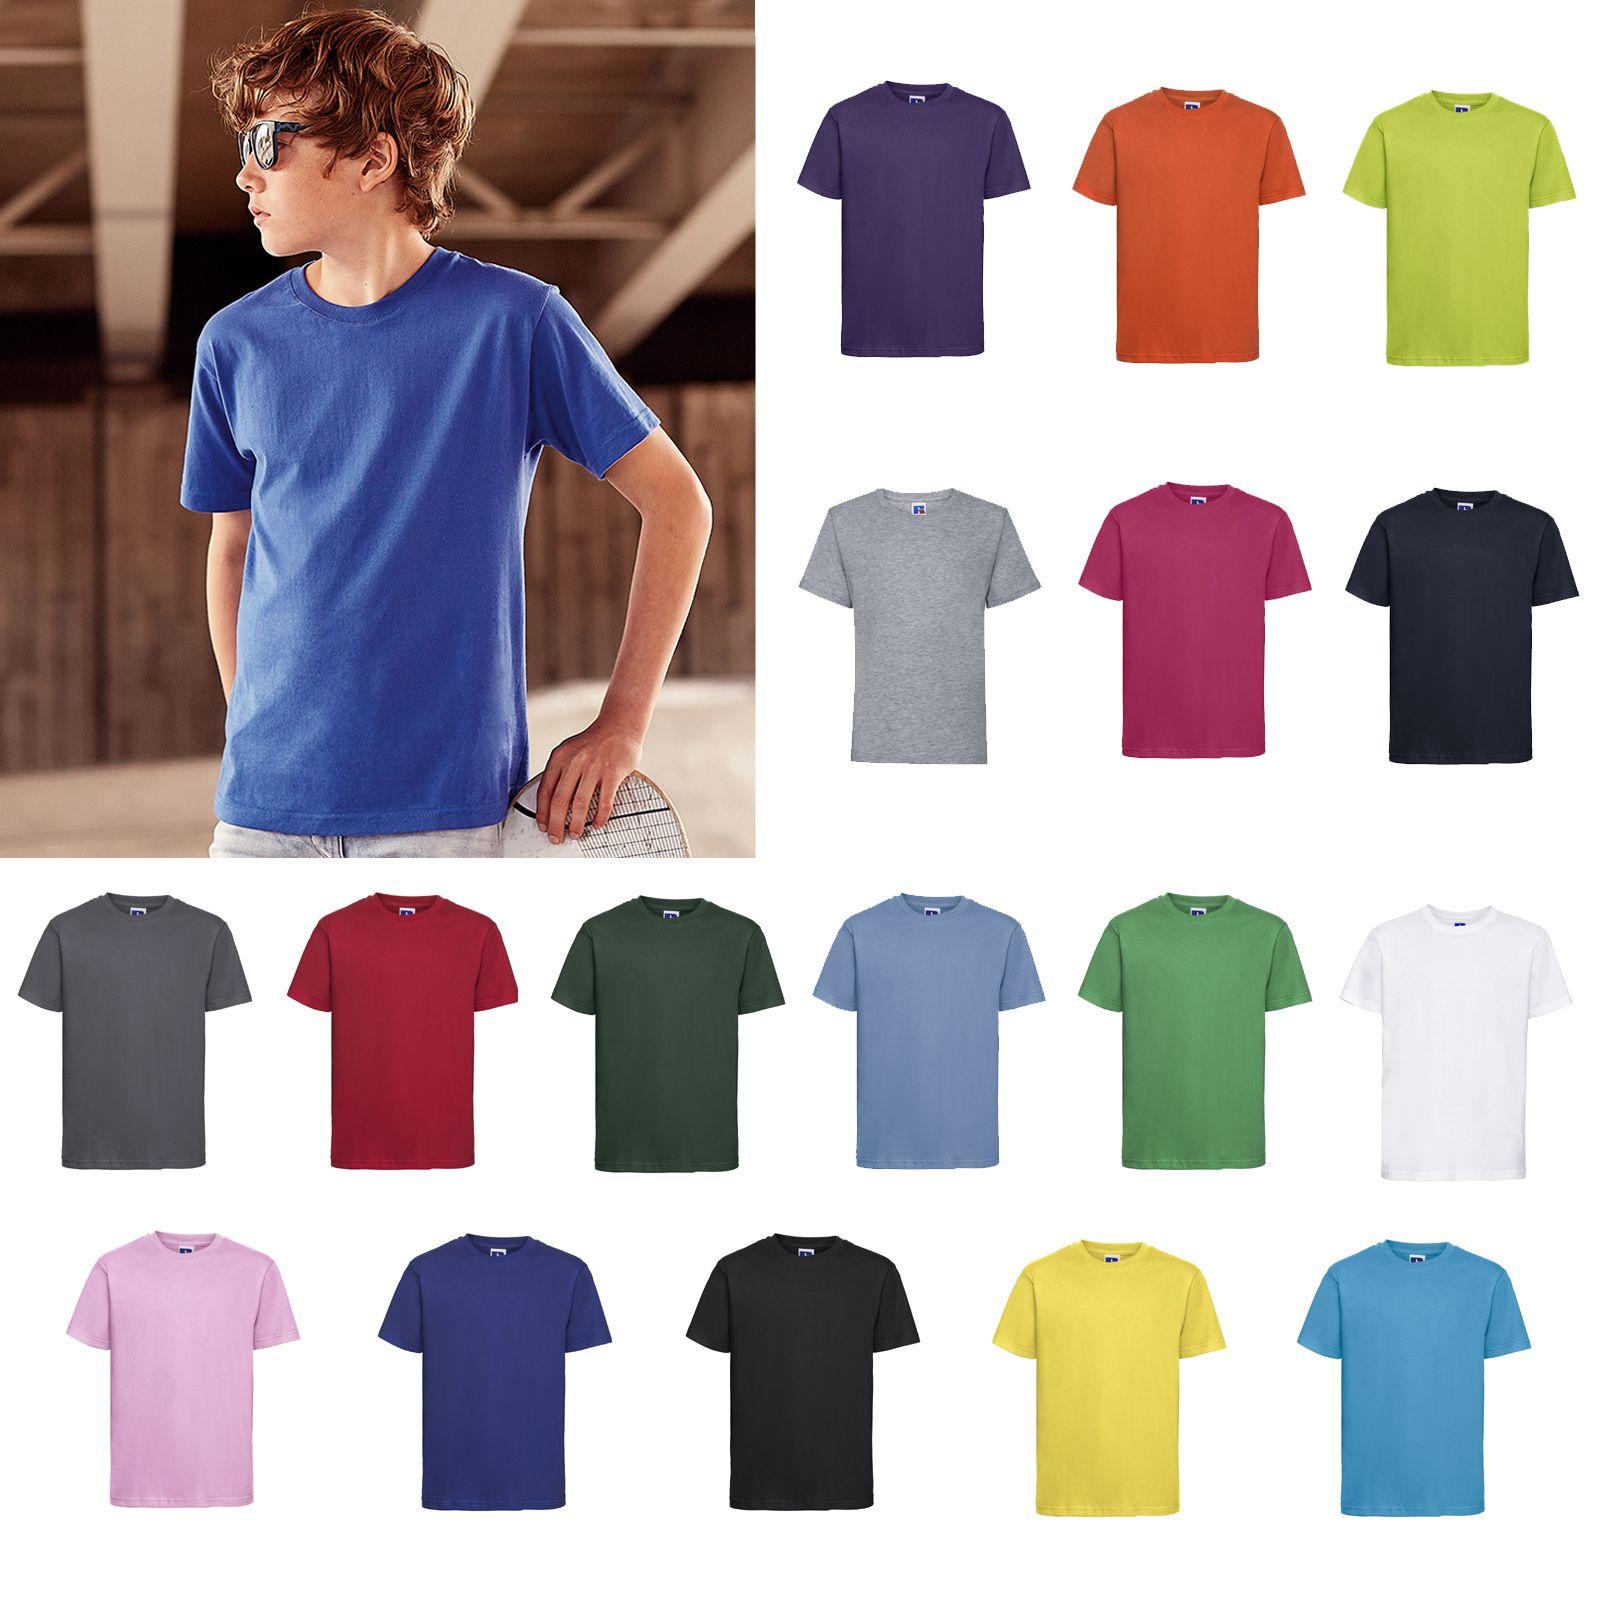 Jerzees Schoolgear Kids Slim Fit T-shirt R-155B-0 - Crew Neck Short Sleeve Tee